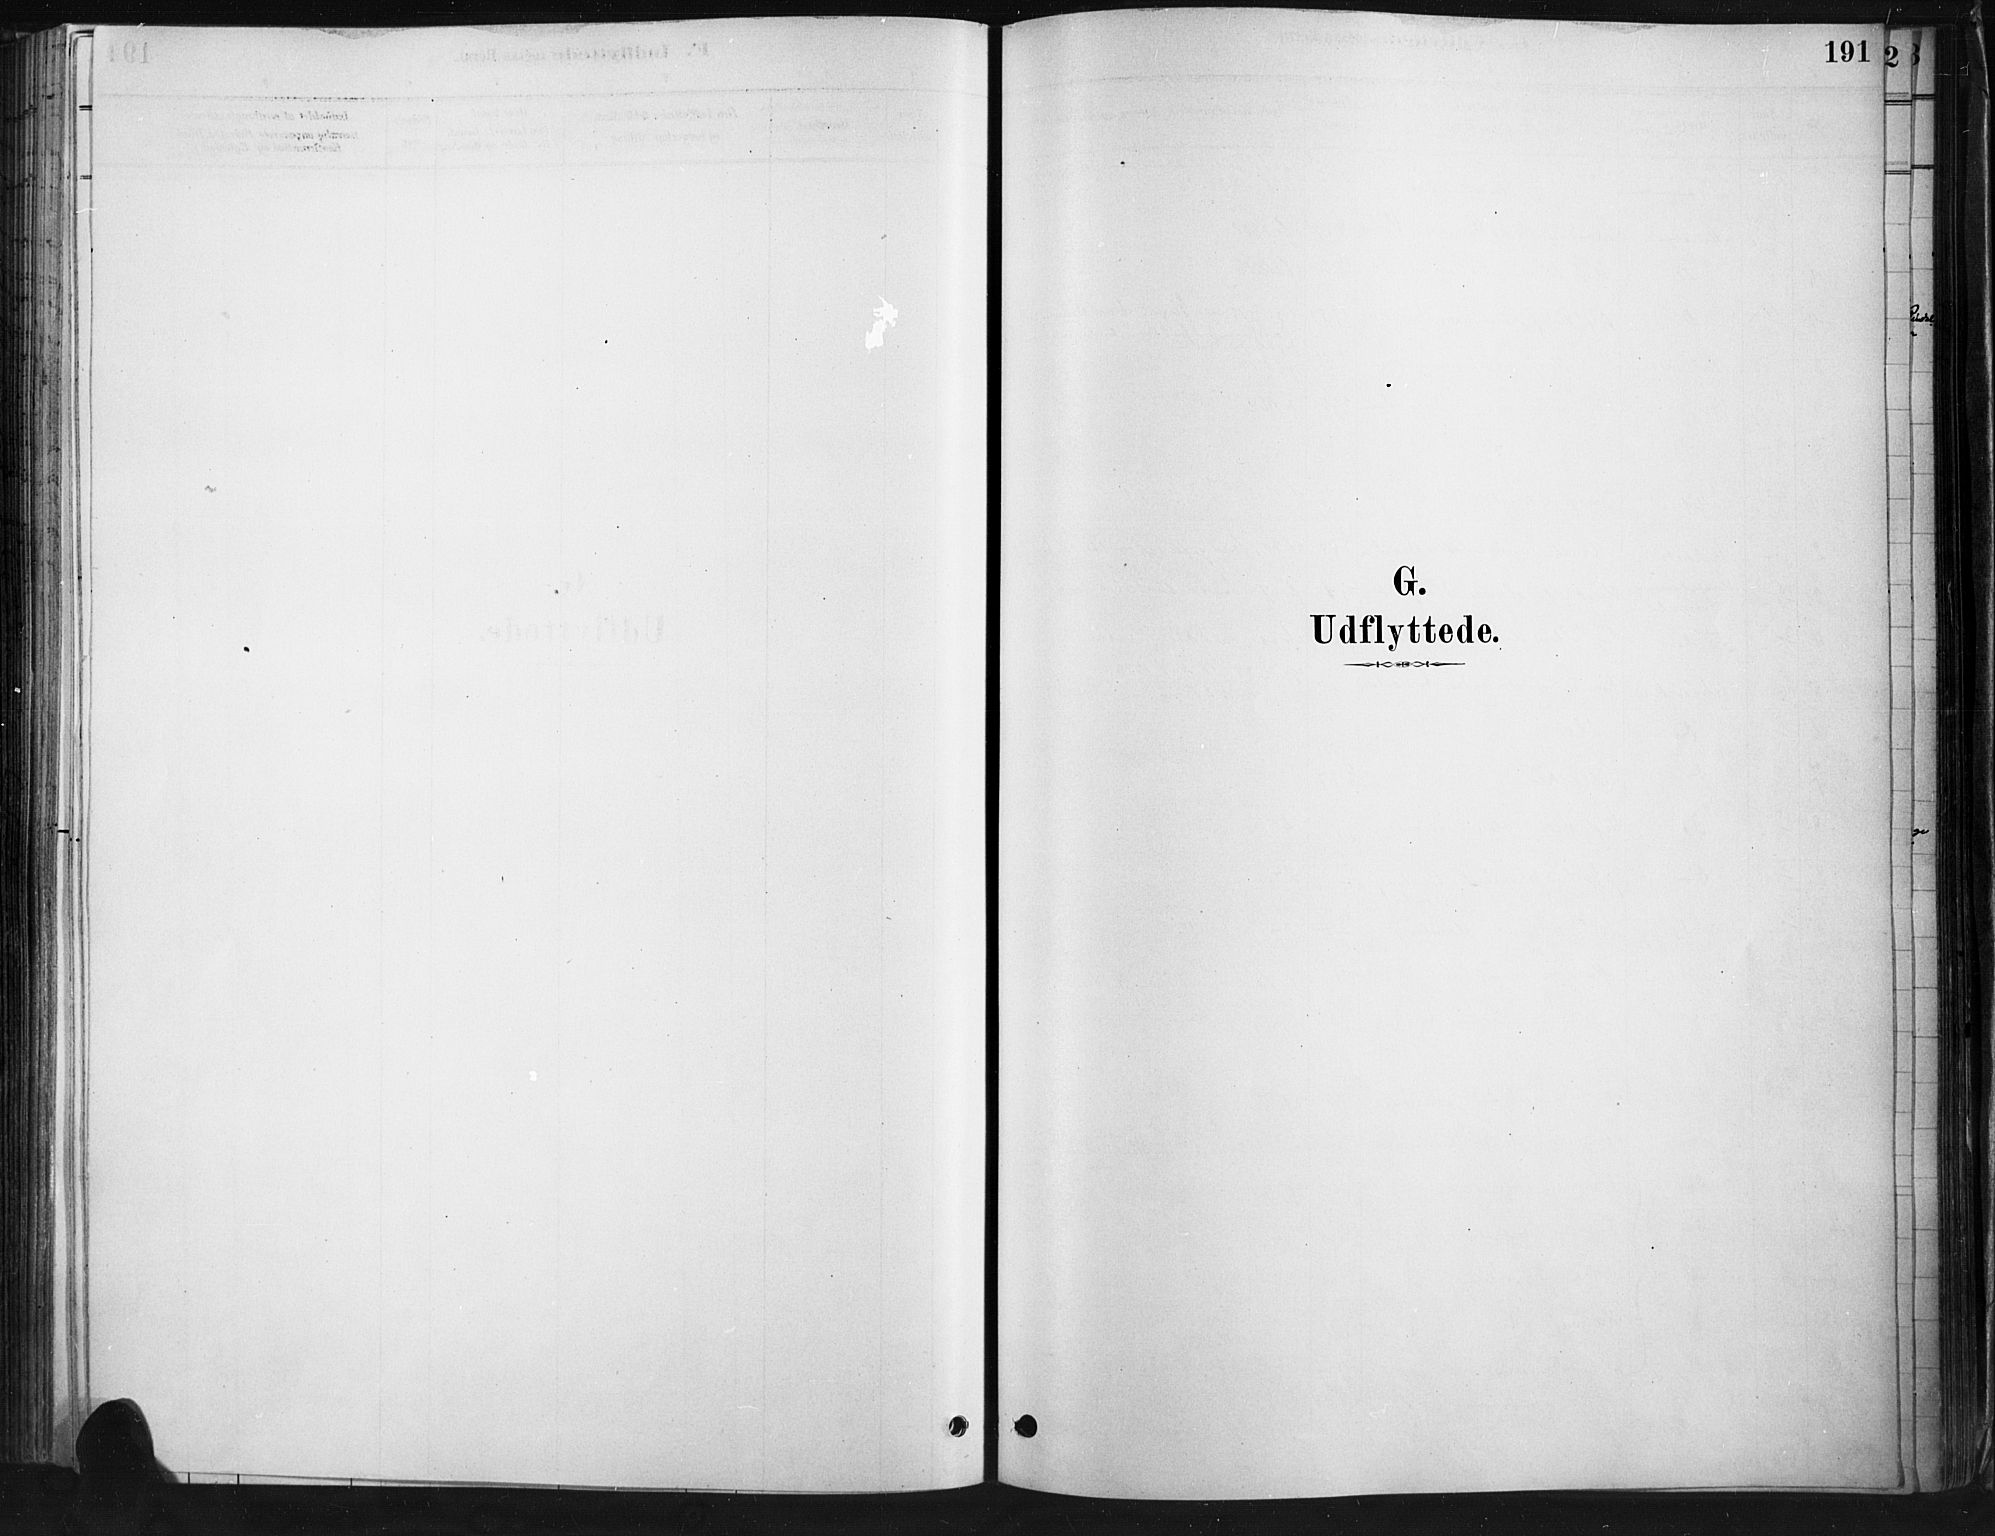 SAH, Ringebu prestekontor, Ministerialbok nr. 9, 1878-1898, s. 191